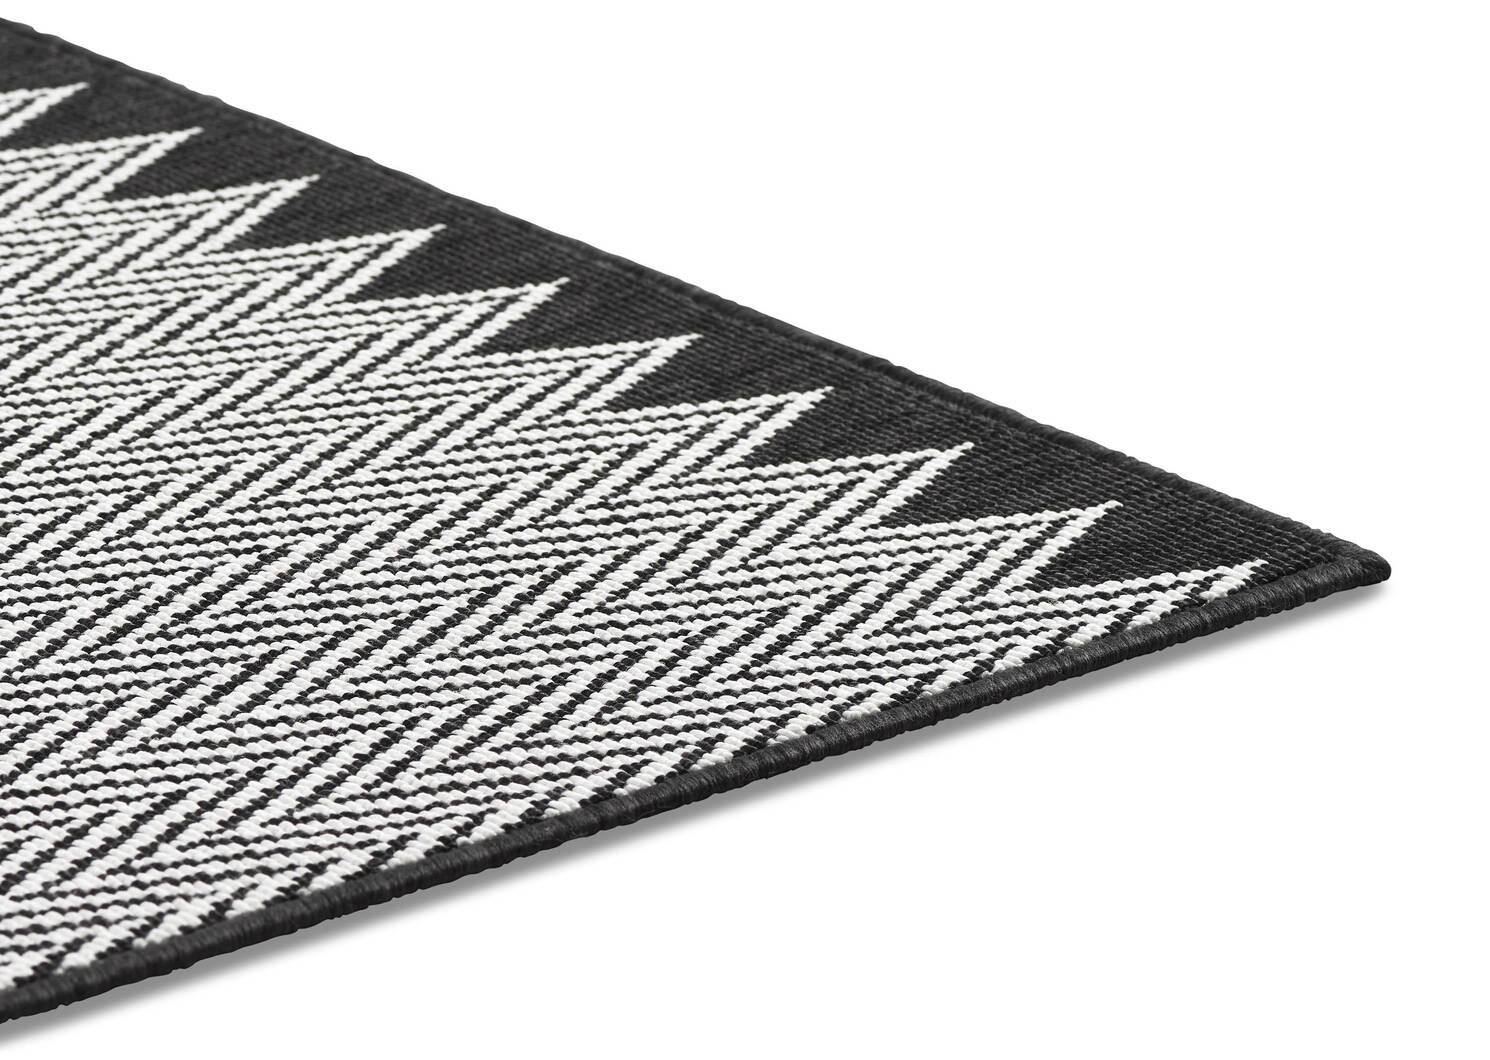 Matira Rug - Zigzag Black/Ivory